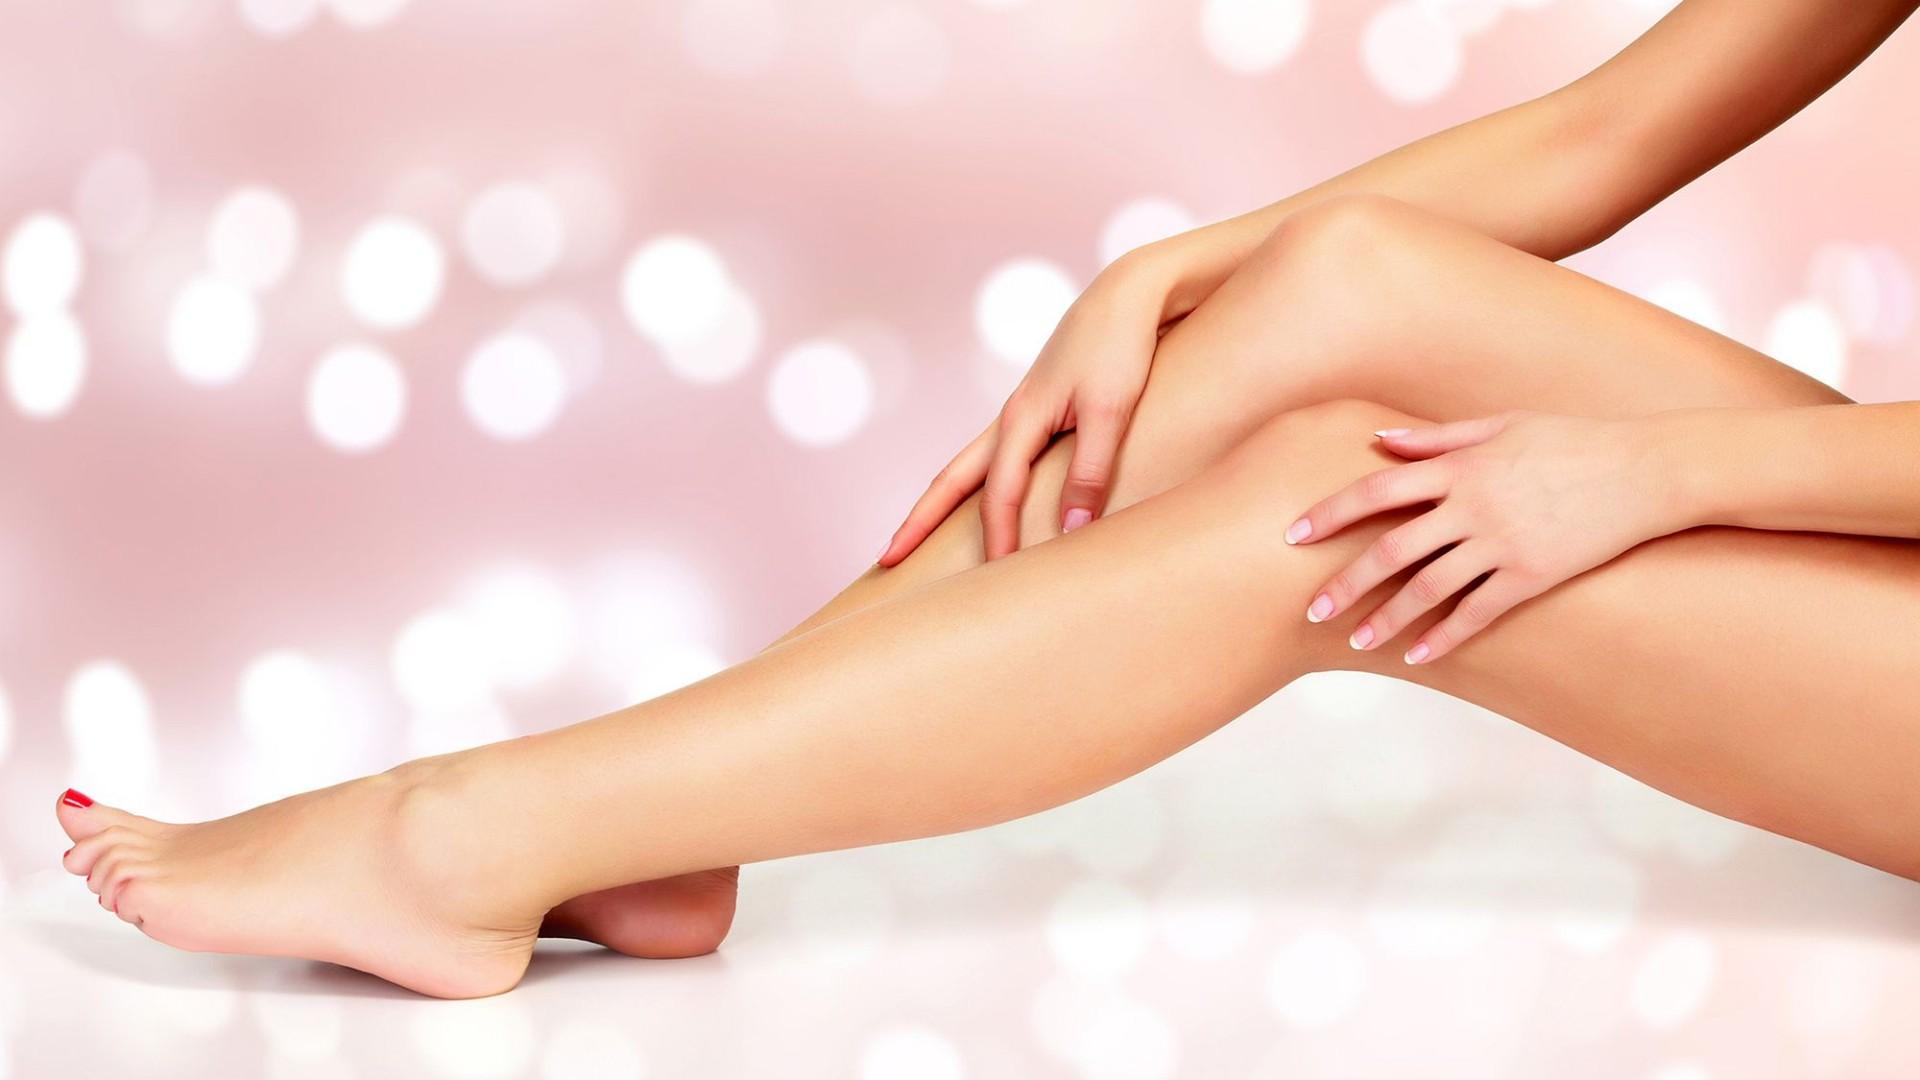 000 depilación láser piernas belleza estetica